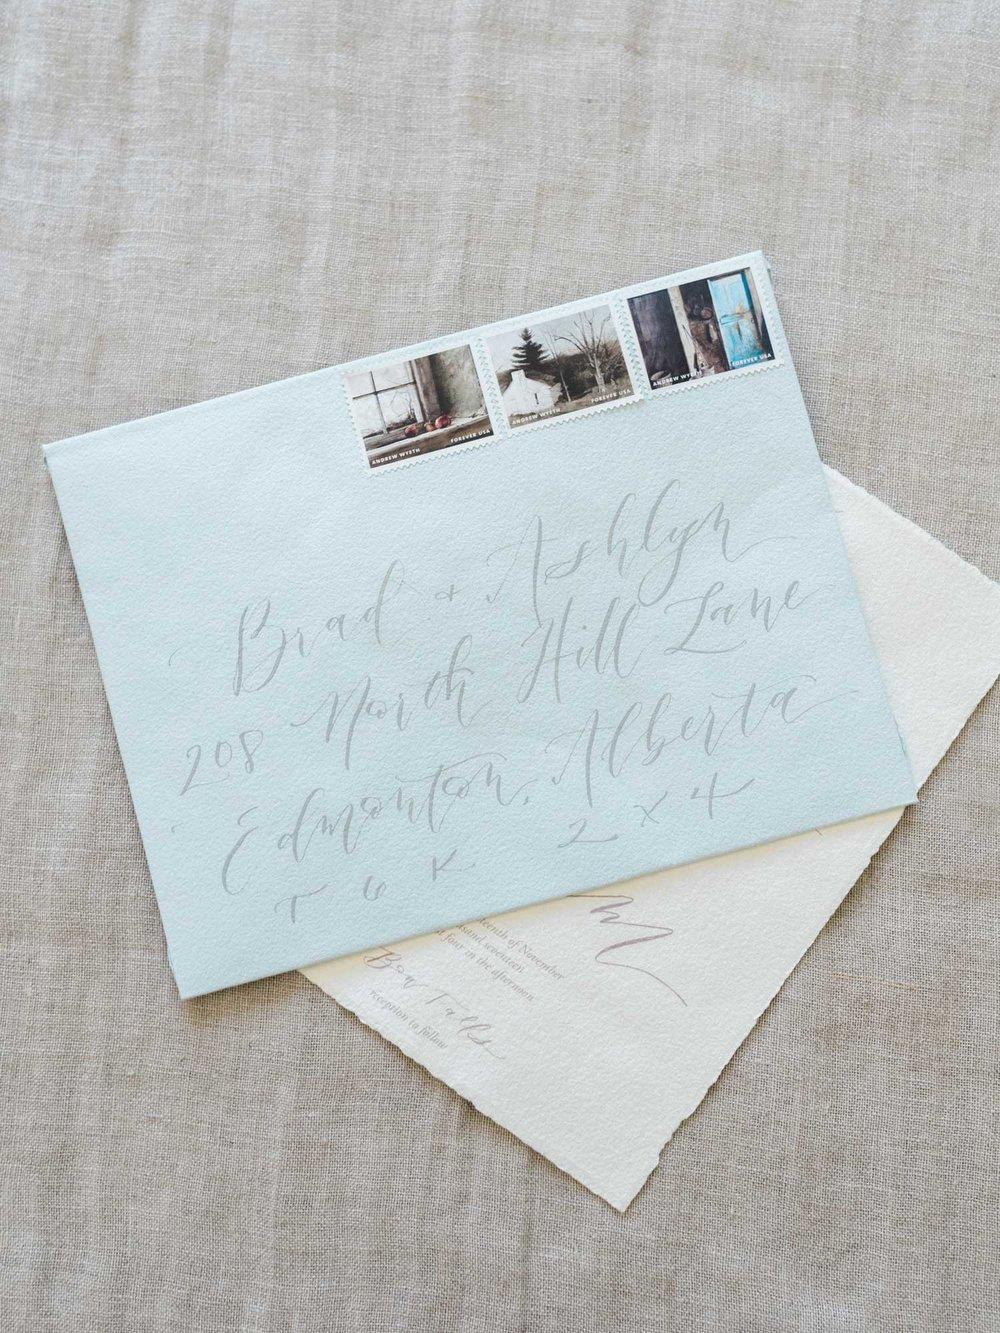 Calligraphy envelope addressing